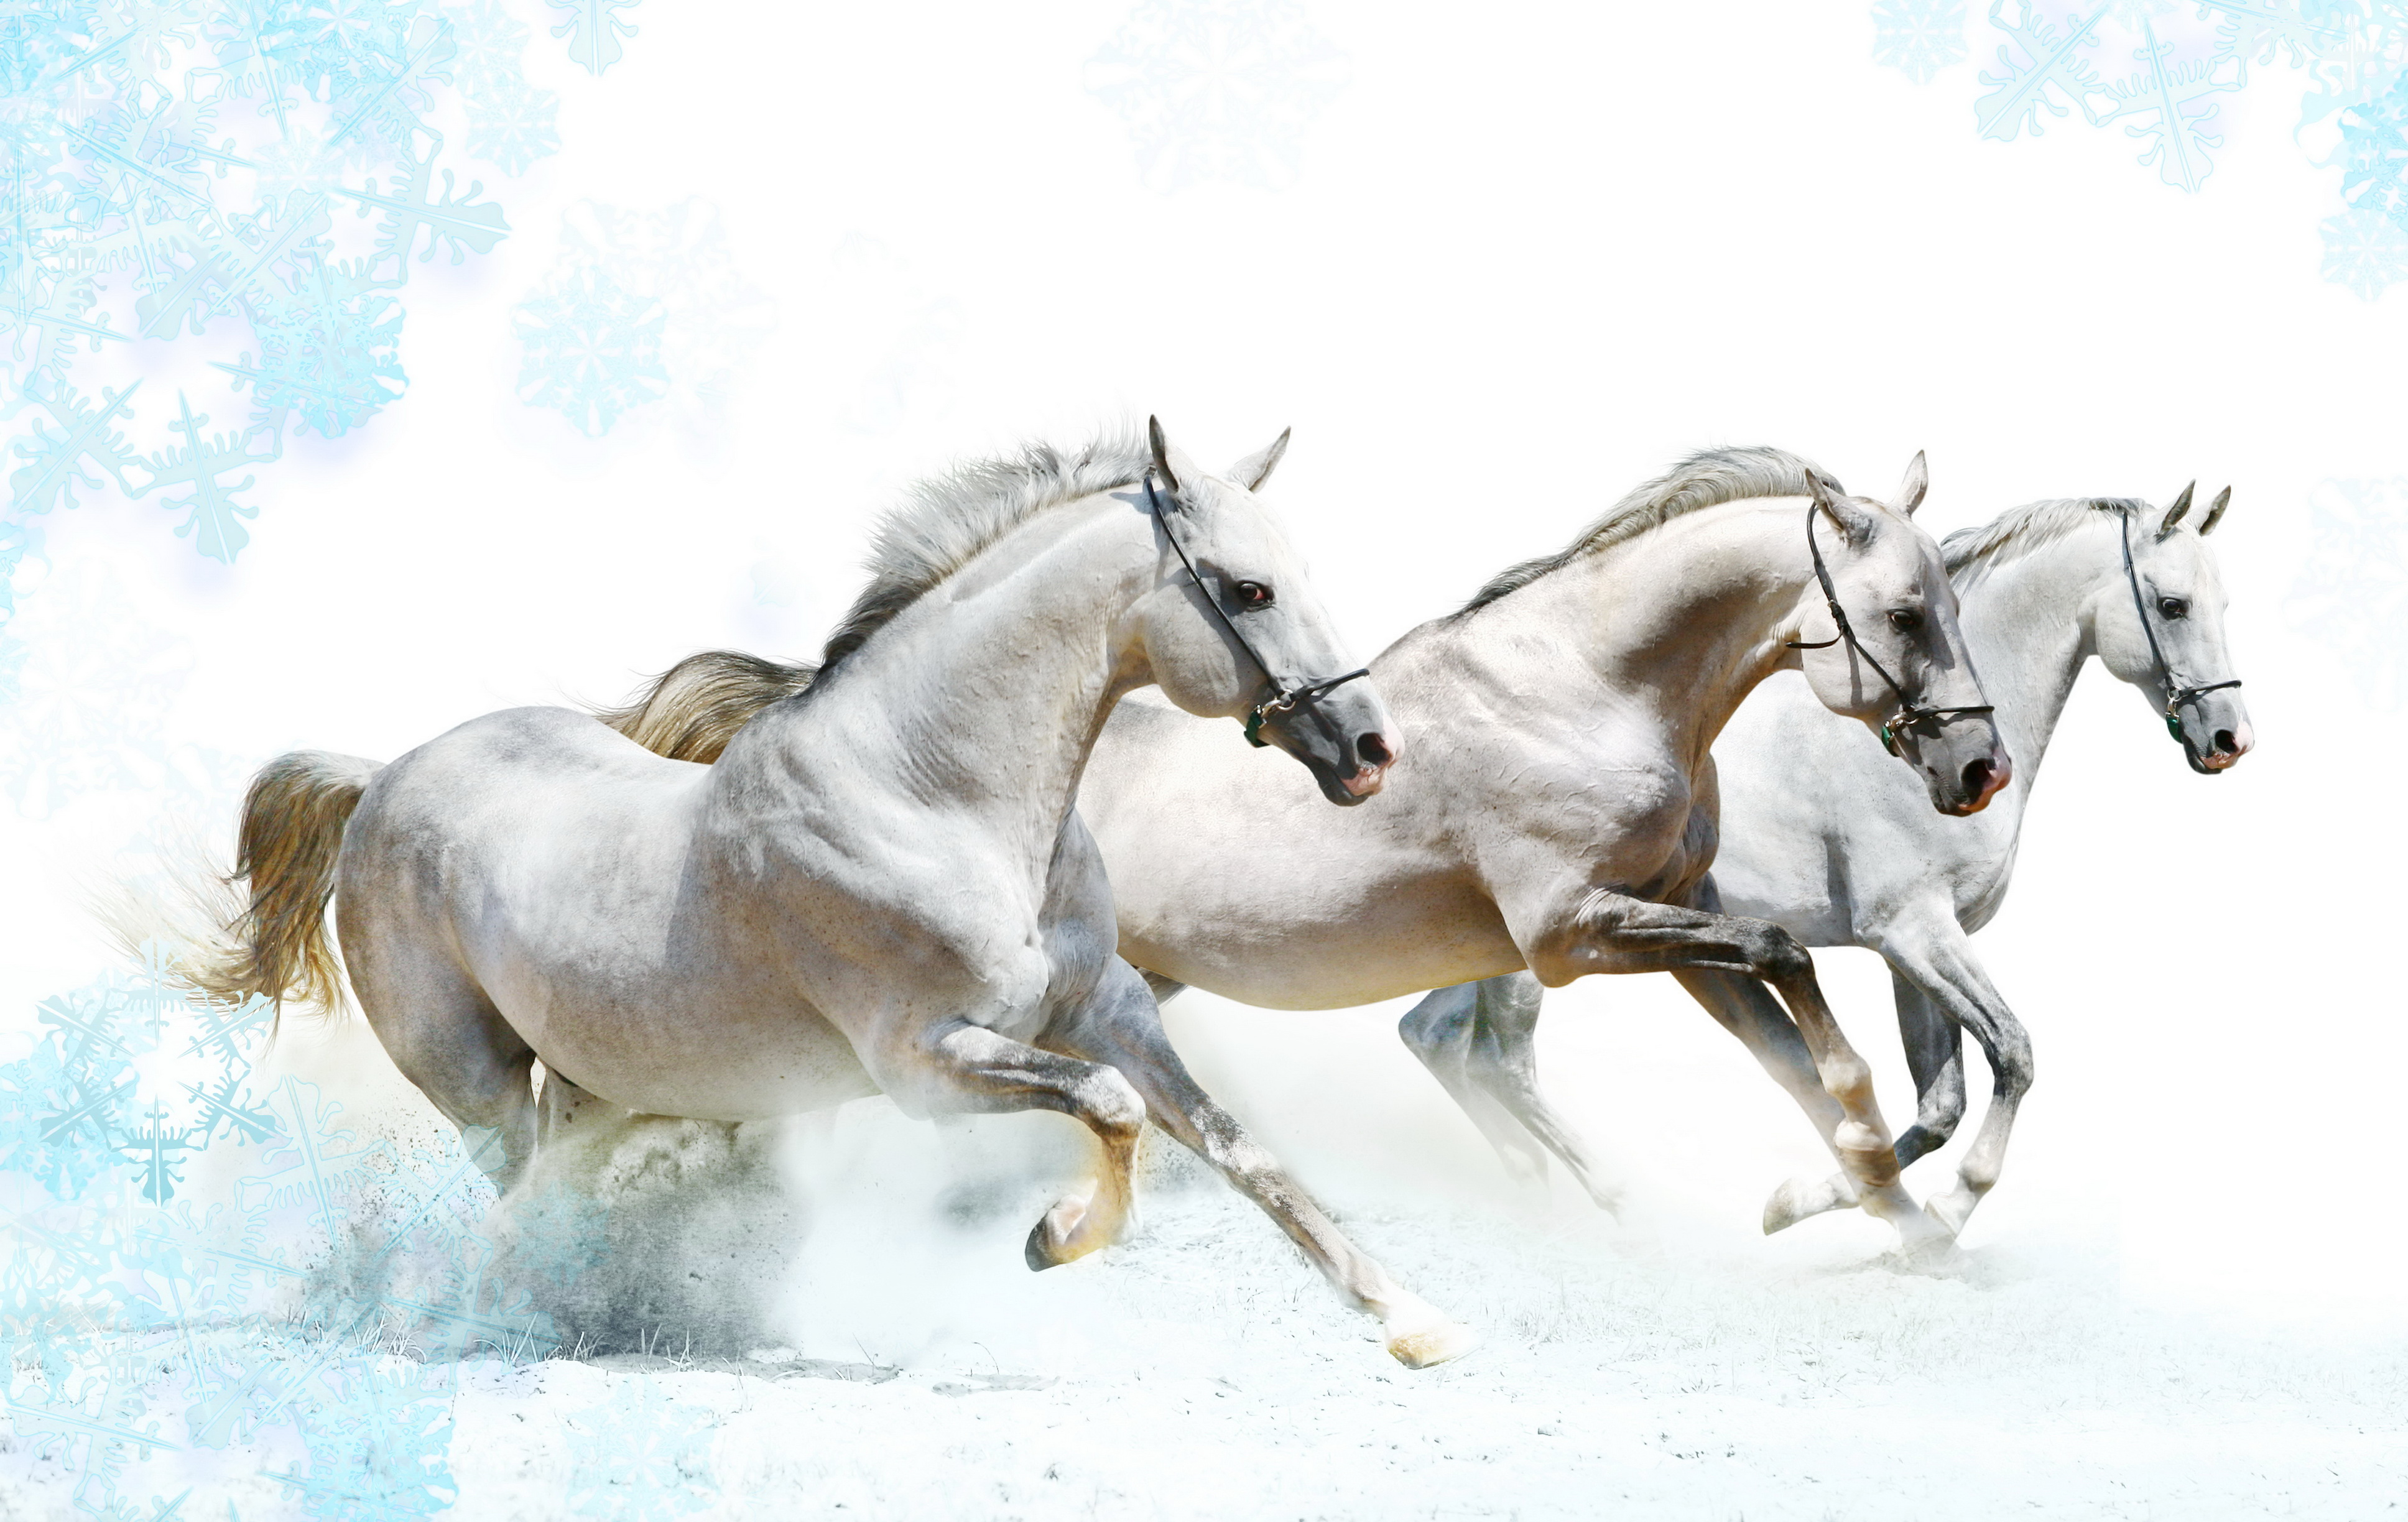 Horse Scenery Wallpaper Wallpaperhali Com